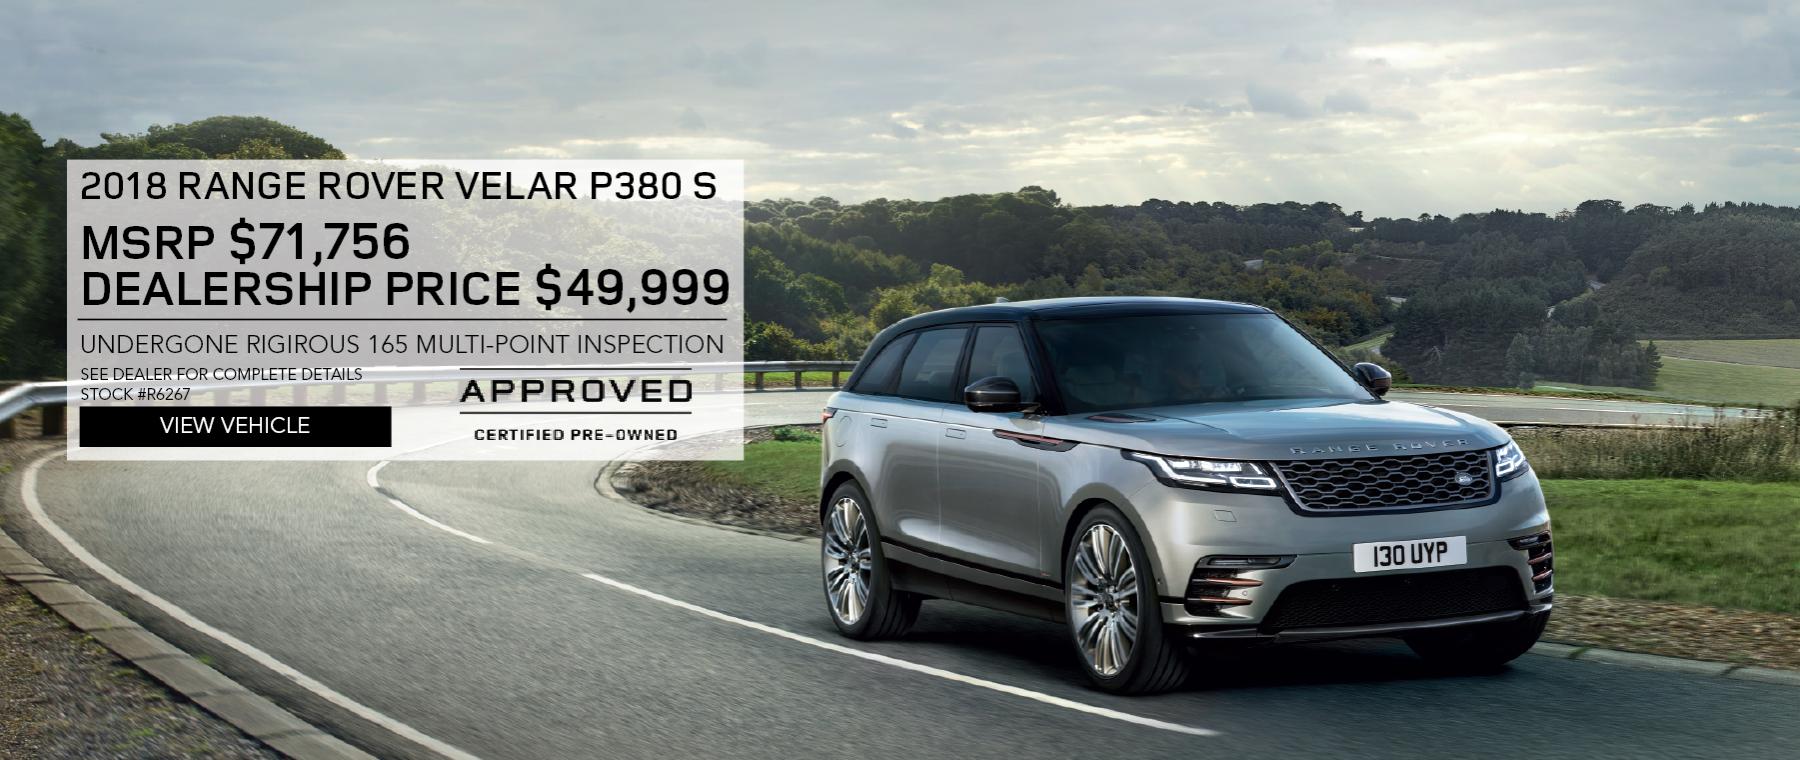 Grey 2018 Range Rover Velar P380 S on winding road. MSRP $71,756 Dealership price $49,999 Stock # R6267. See dealer for compete details. Offer expires 2/29/2020.